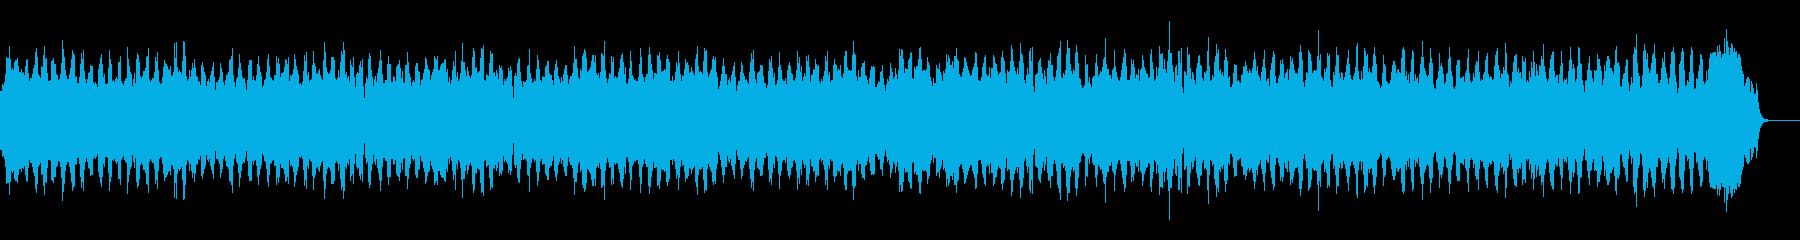 Majestic ballad / orchestra's reproduced waveform